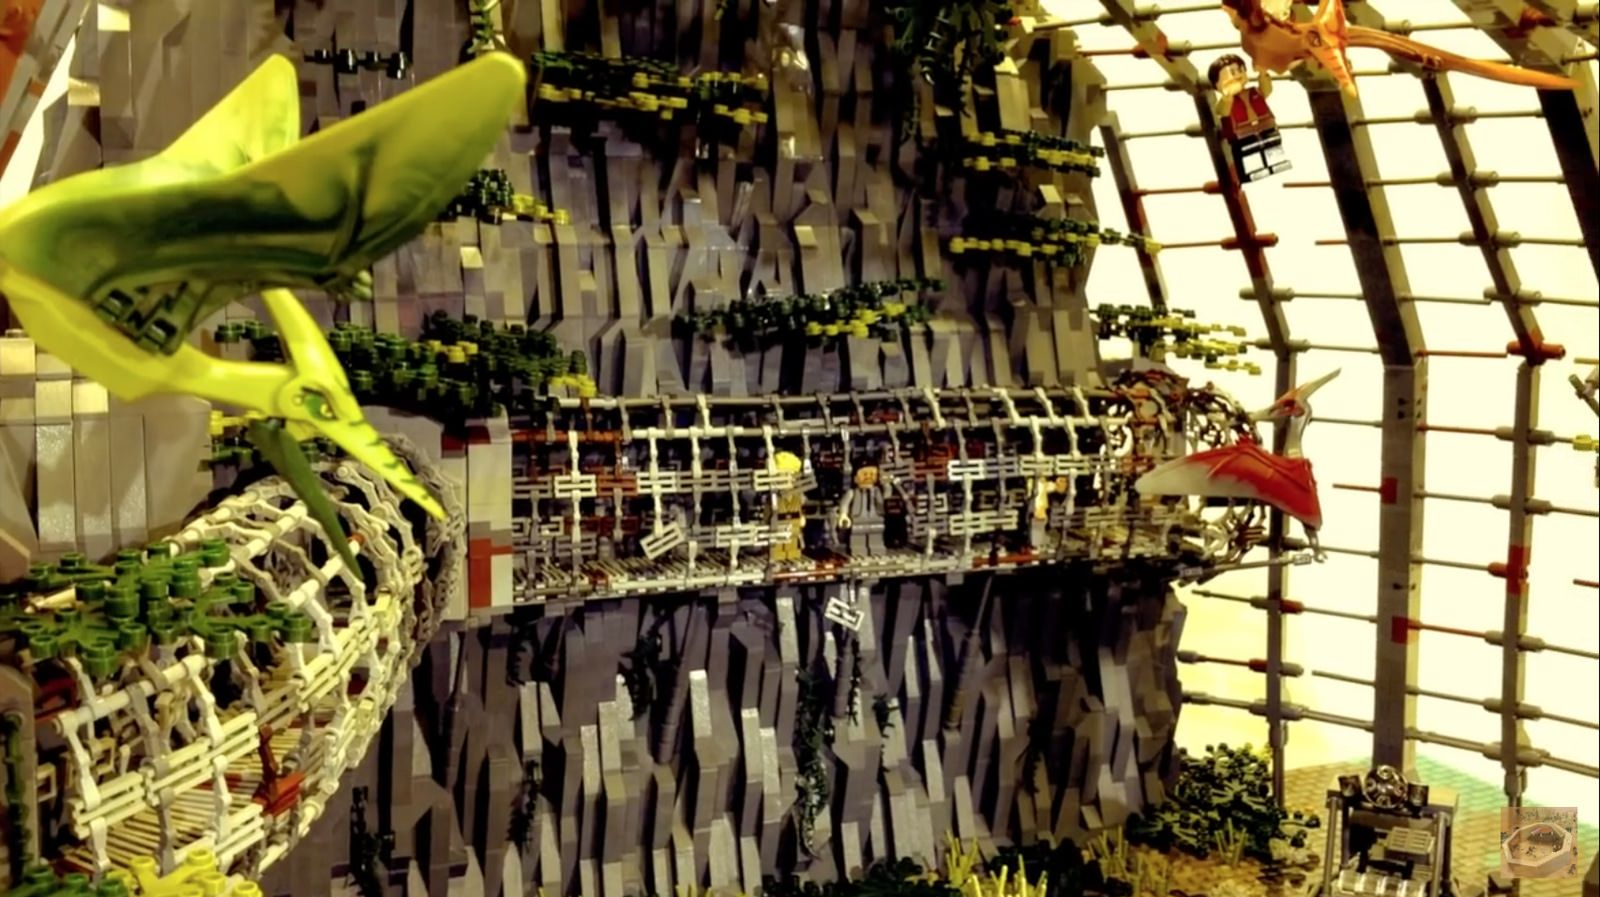 lego jurassic world park moc | lego | lego jurassic, lego jurassic